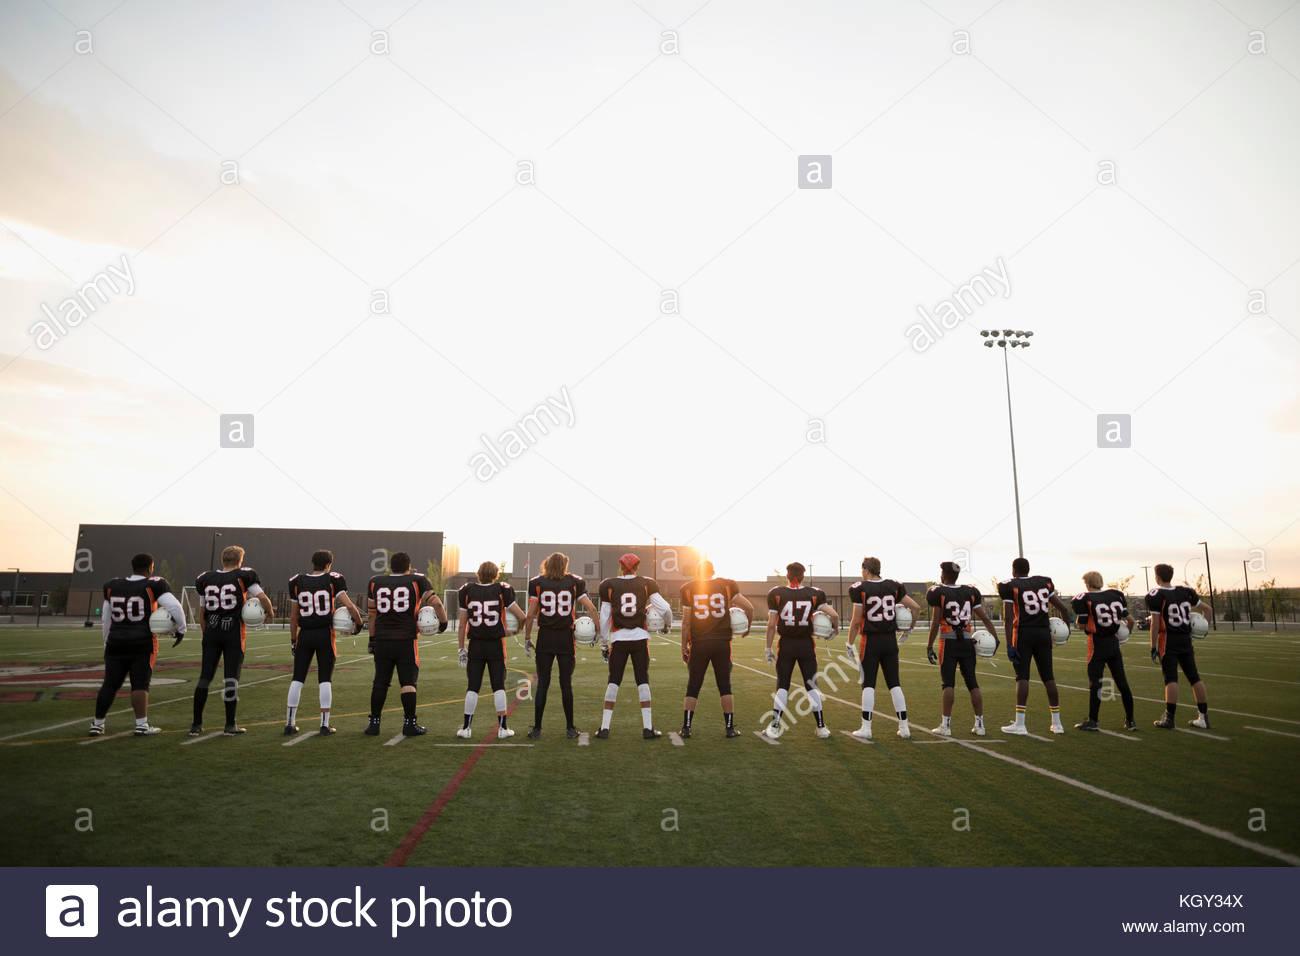 Rear view teenage boy high school football team standing in a row on football field - Stock Image